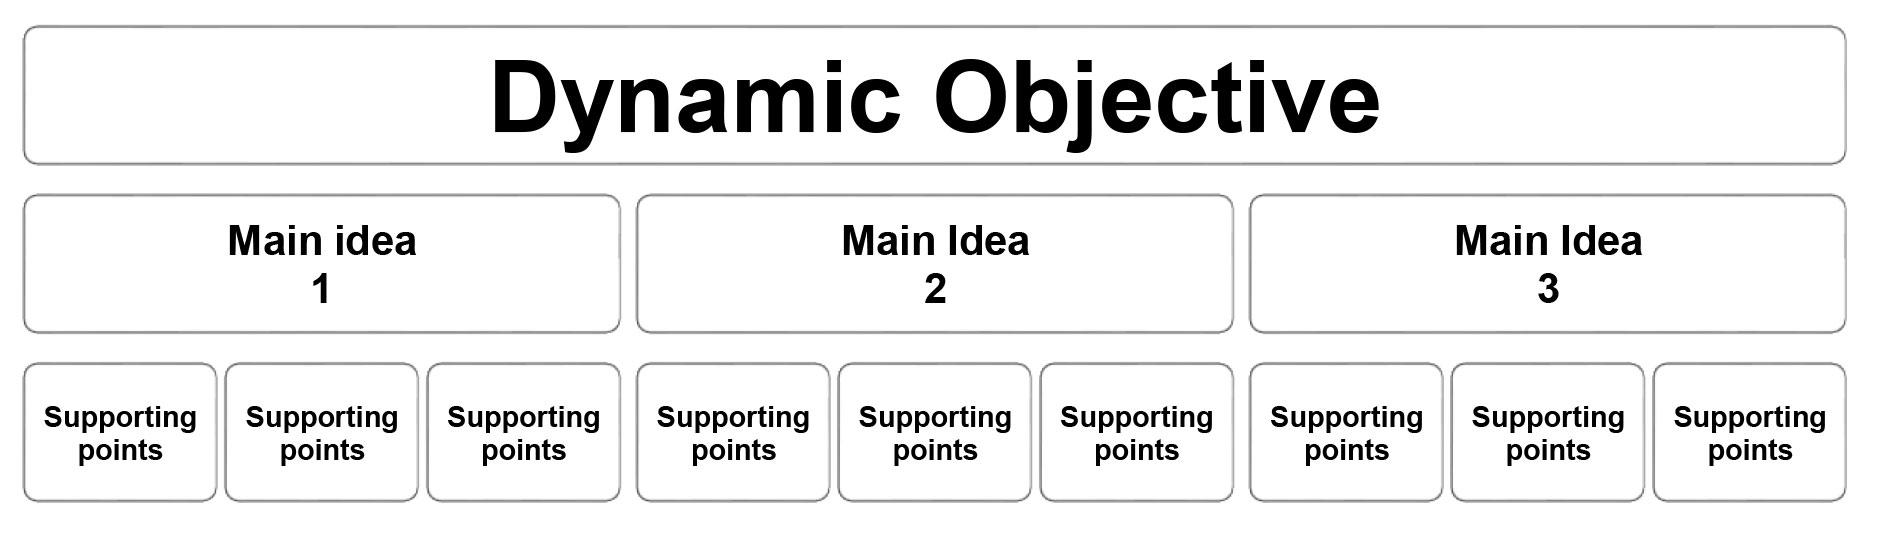 New-Presentation-Articles-1